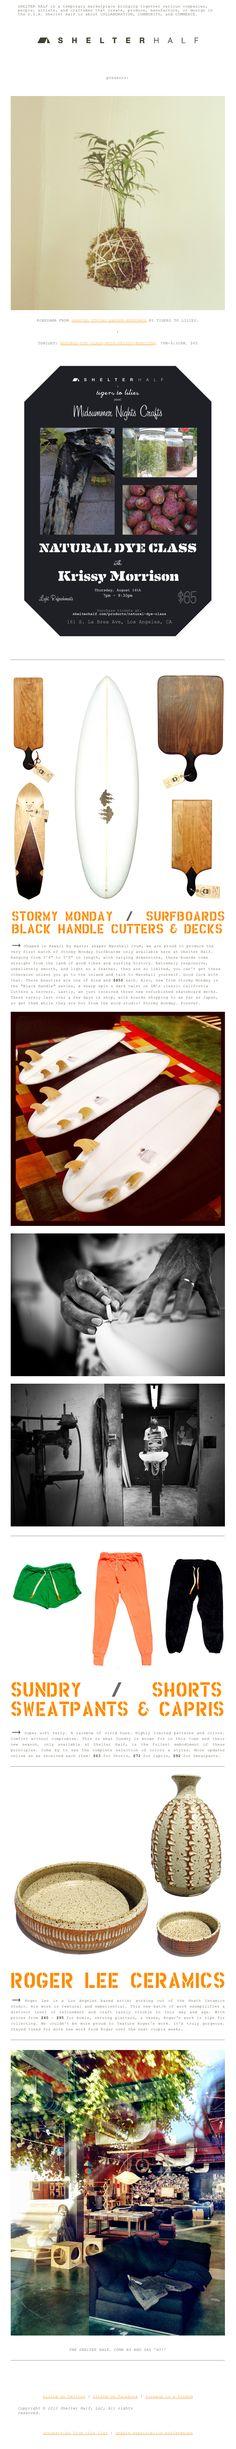 Shelter Half Exclusives: Stormy Monday Surfboards, Sundry's New Season, & Roger Lee Ceramics. Newsletter Ideas, Newsletter Design, Shelter, Shapes, Check, Email Newsletter Design